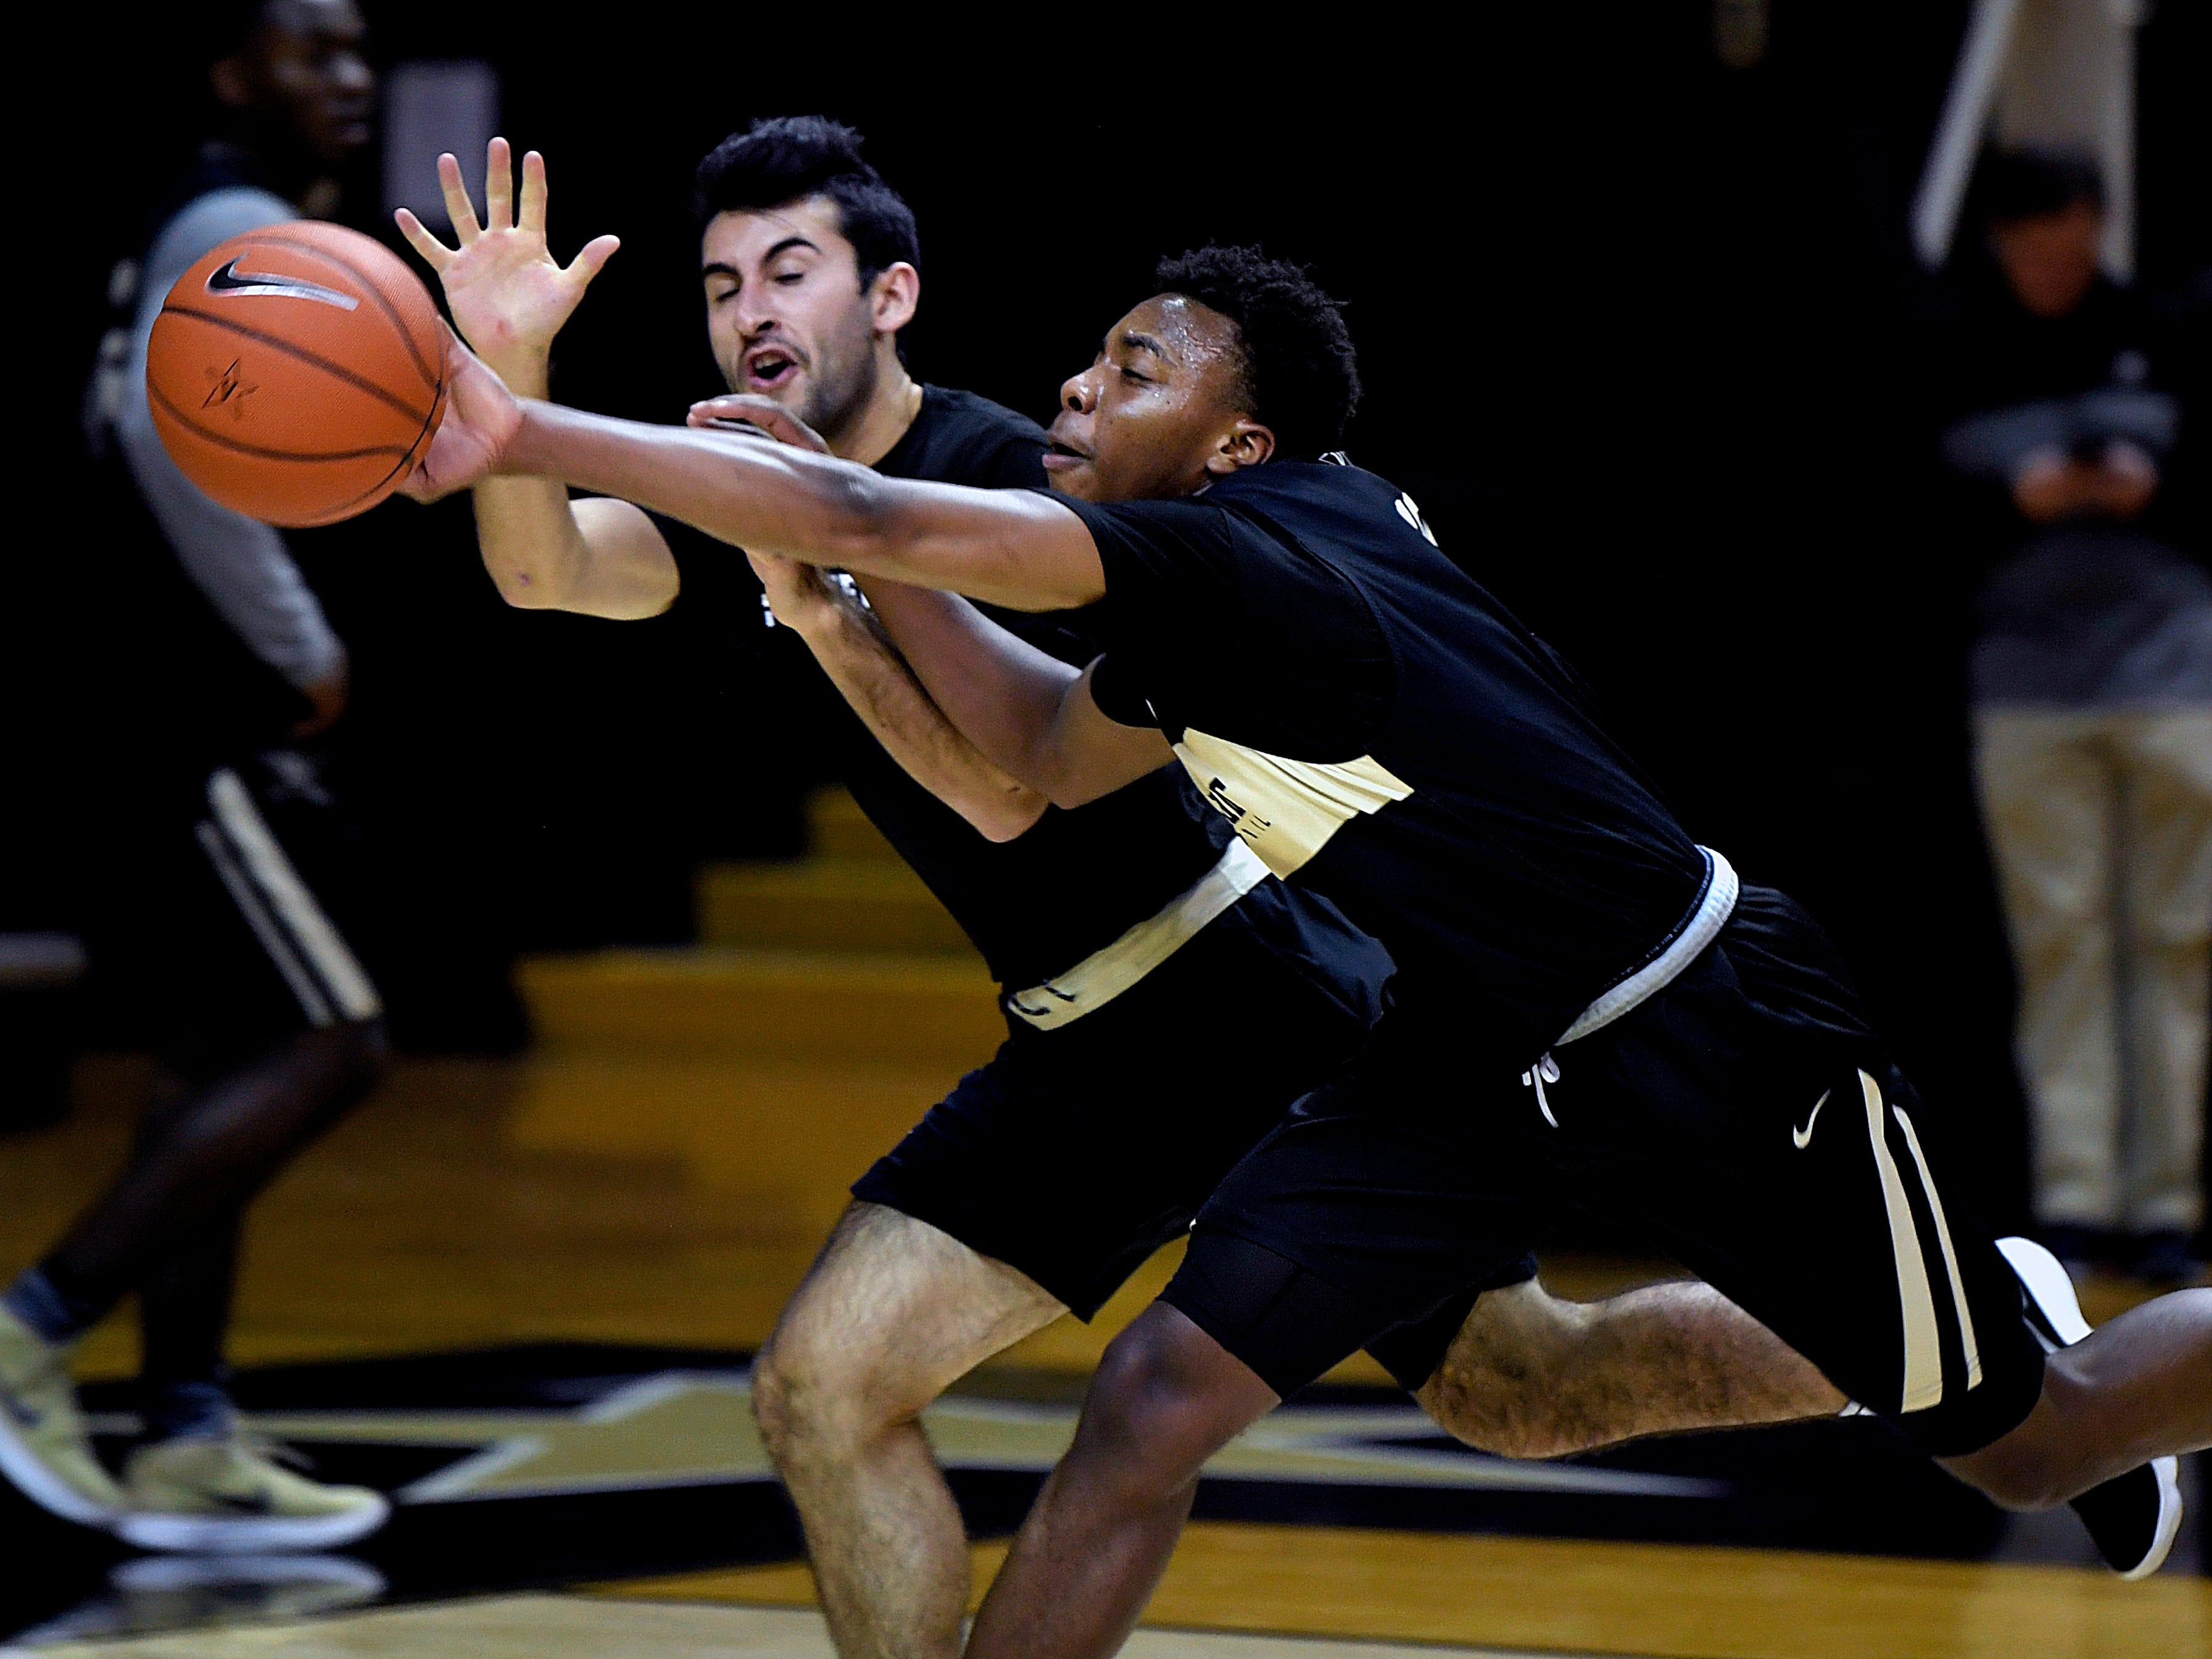 Vanderbilt basketball freshman Darius Garland blocks a pass during practice on Monday, Oct, 22, 2018.